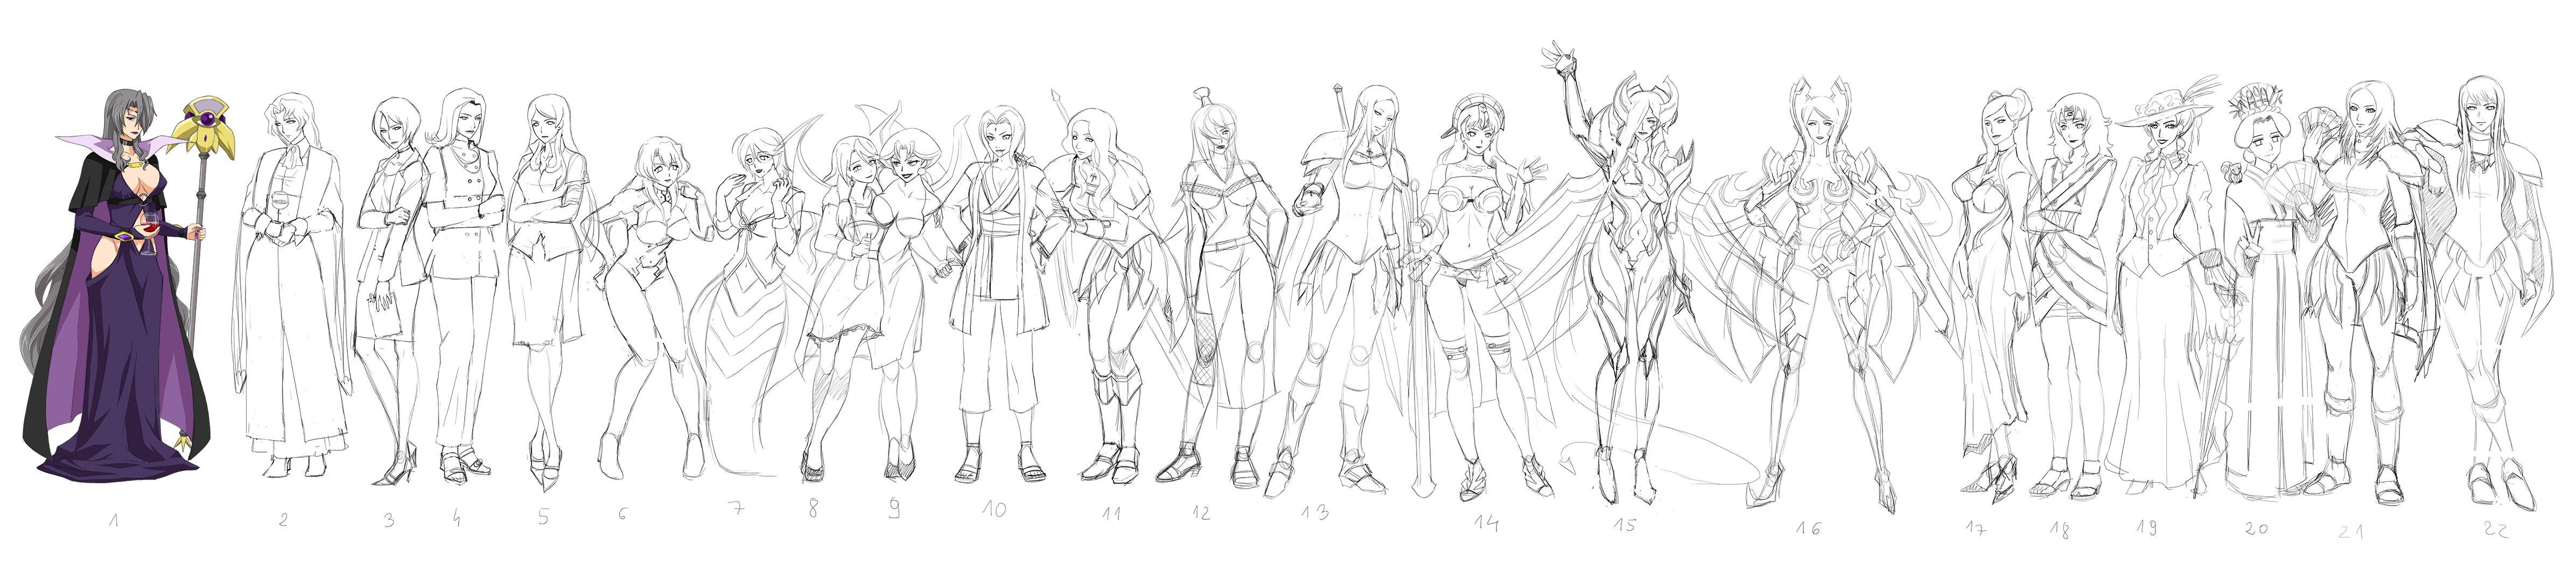 Guess anime characters anime characters anime character